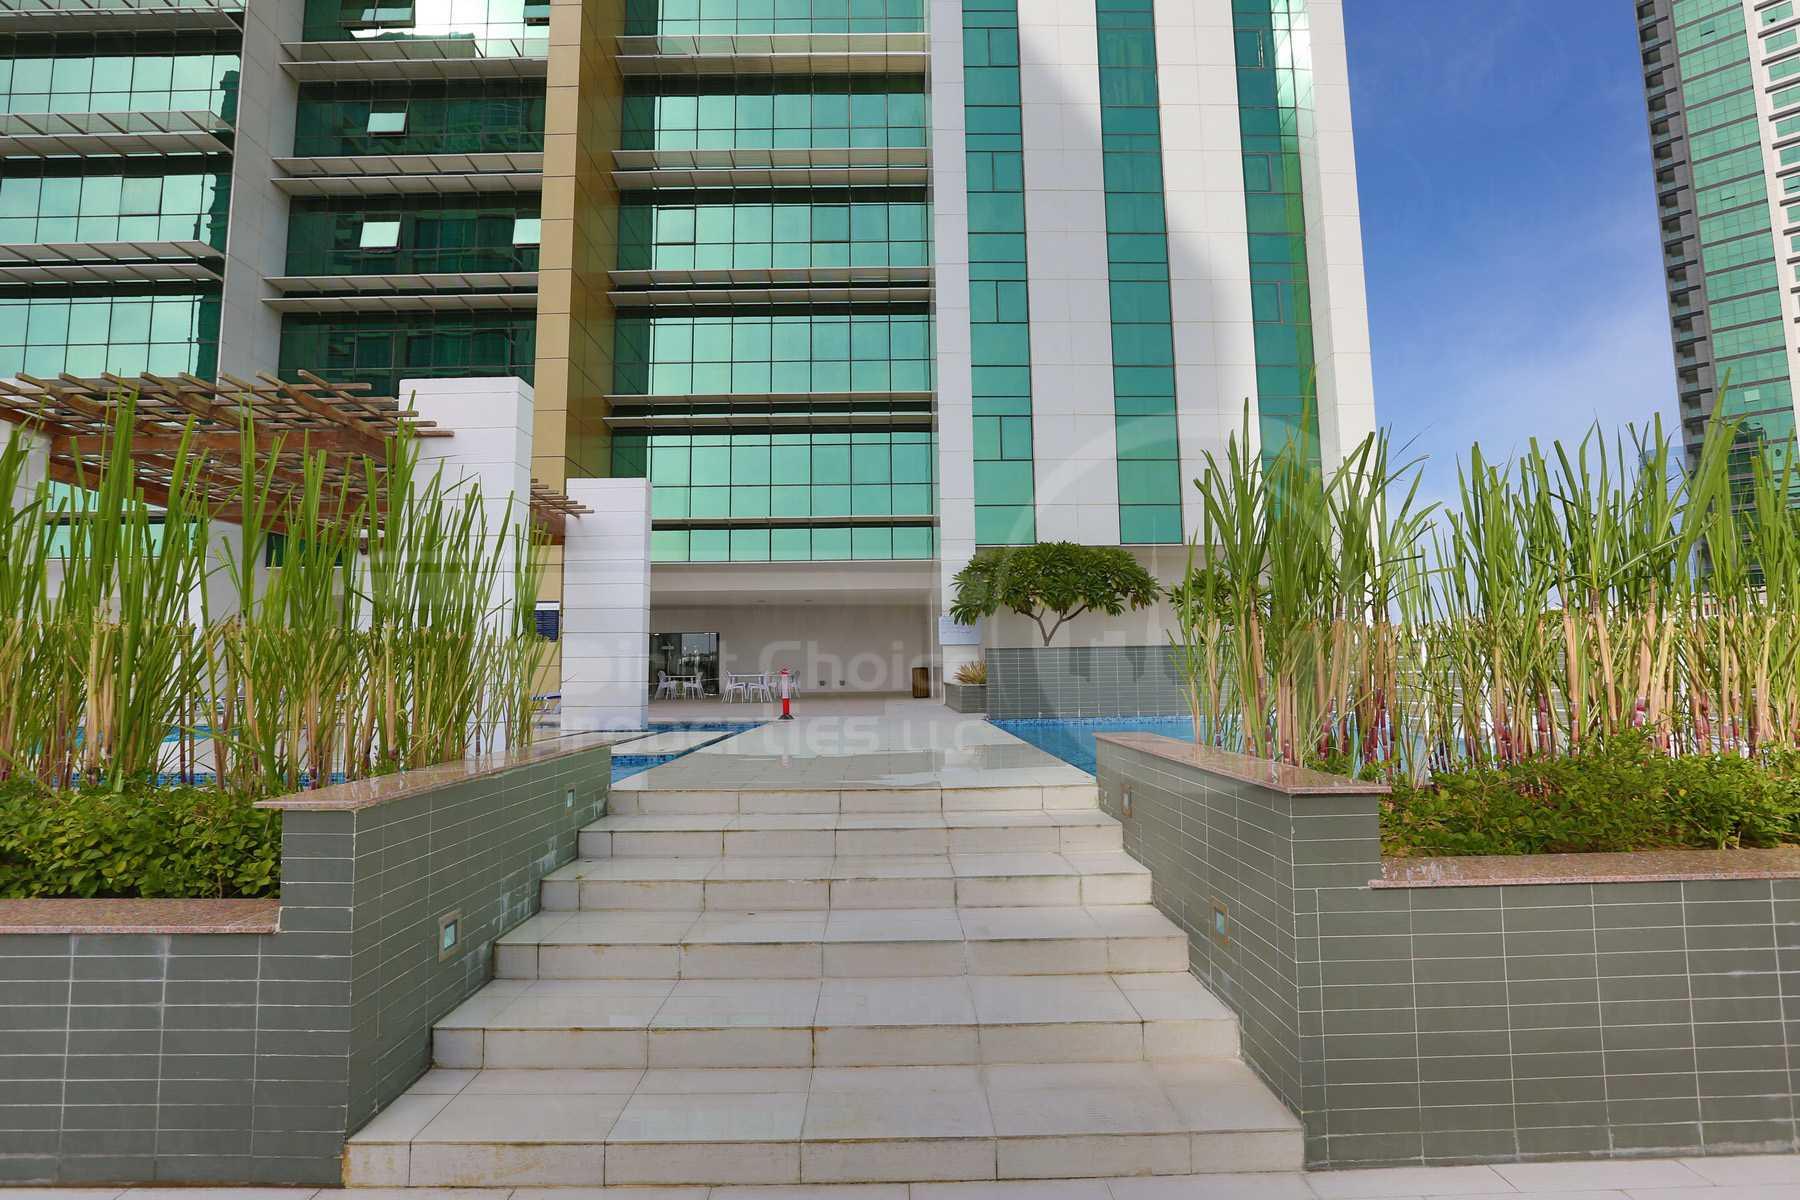 Studio - 1BR - 2BR - 3BR - 4BR Apartment - Abu Dhabi - UAE - Al Reem Island - Tala Tower - Outside View (17).jpg